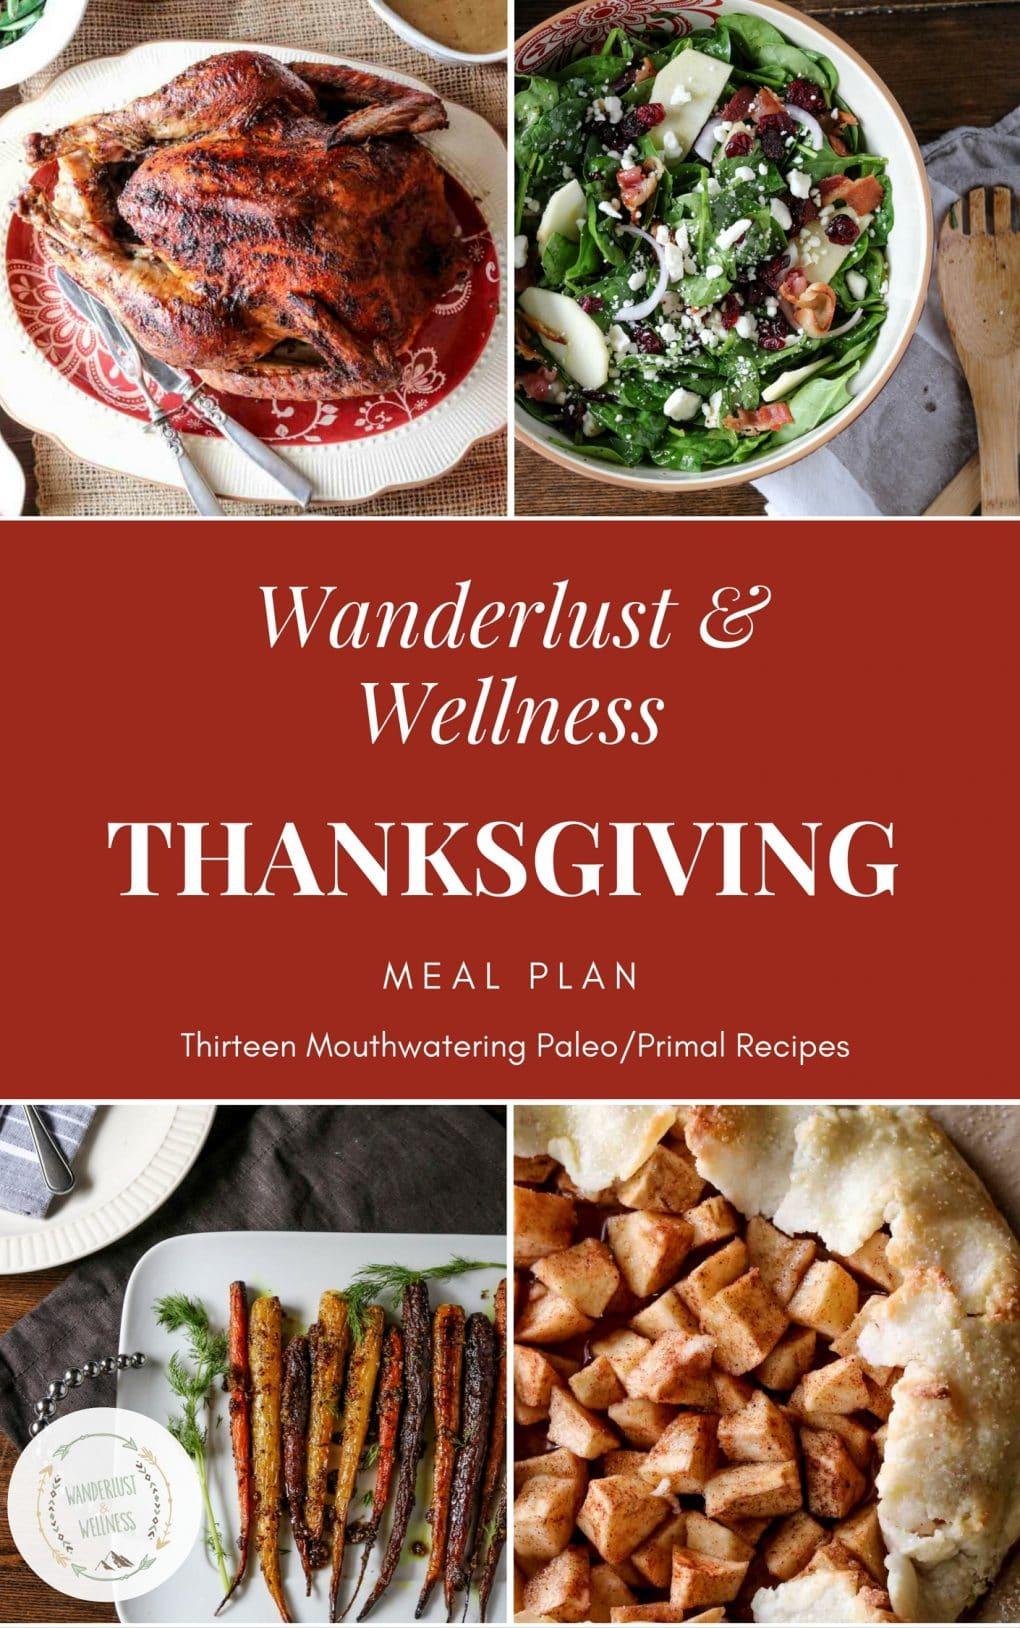 Wanderlust and Wellness Thanksgiving Meal Plan